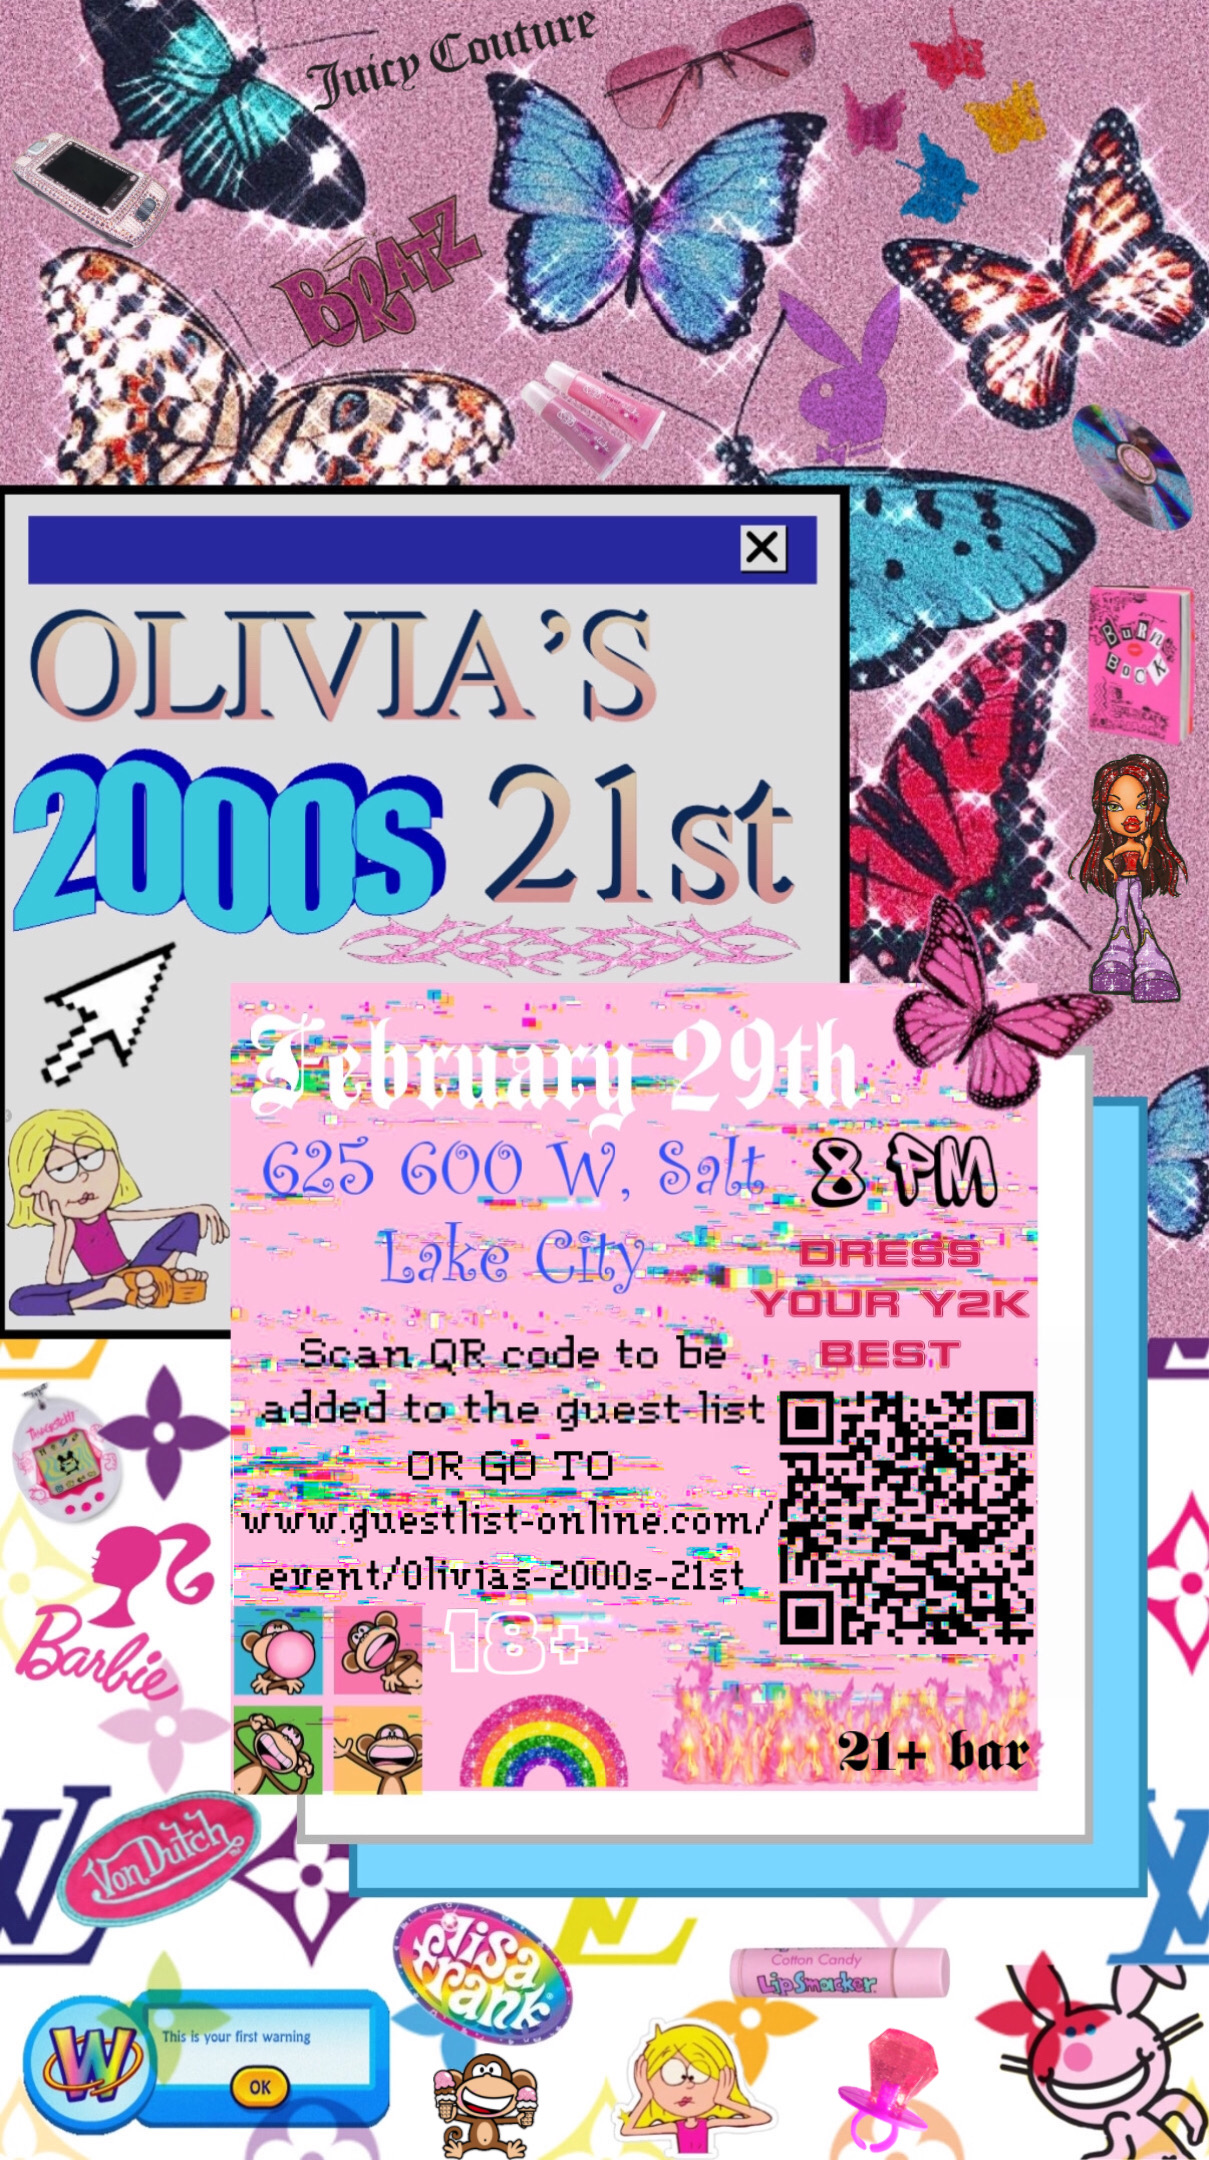 Olivia's 2000s 21st